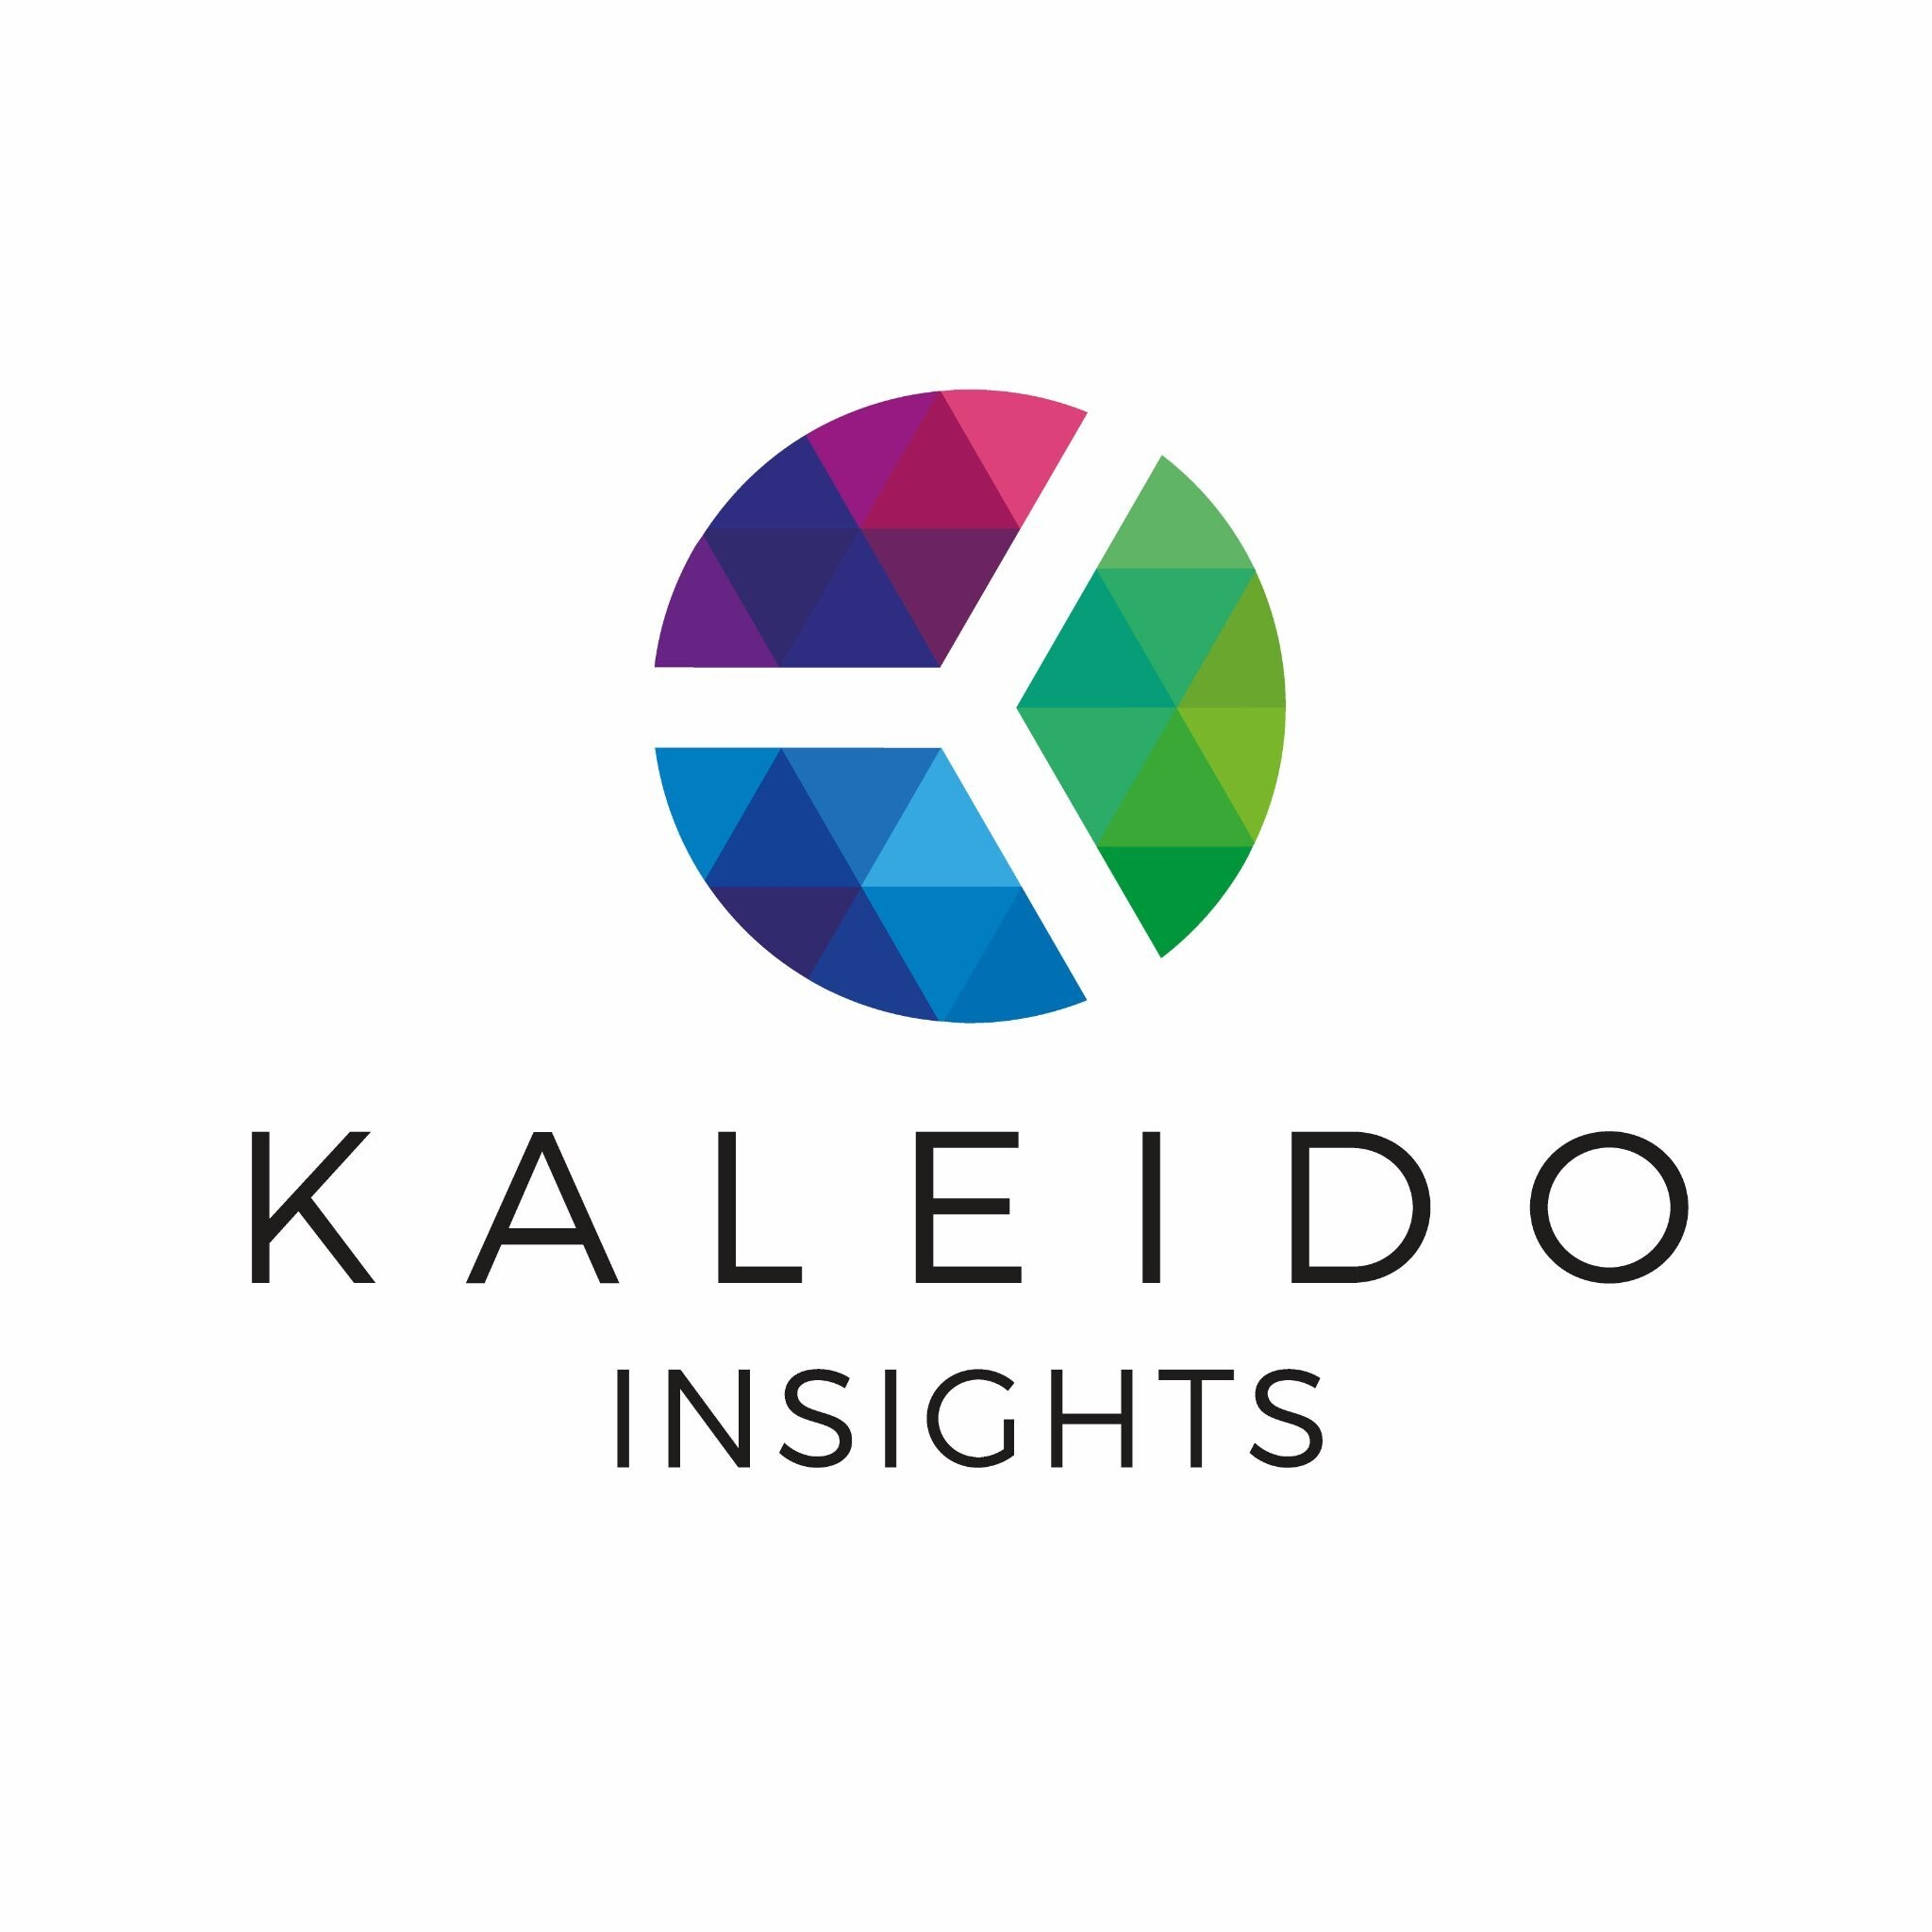 Kaleido Insights